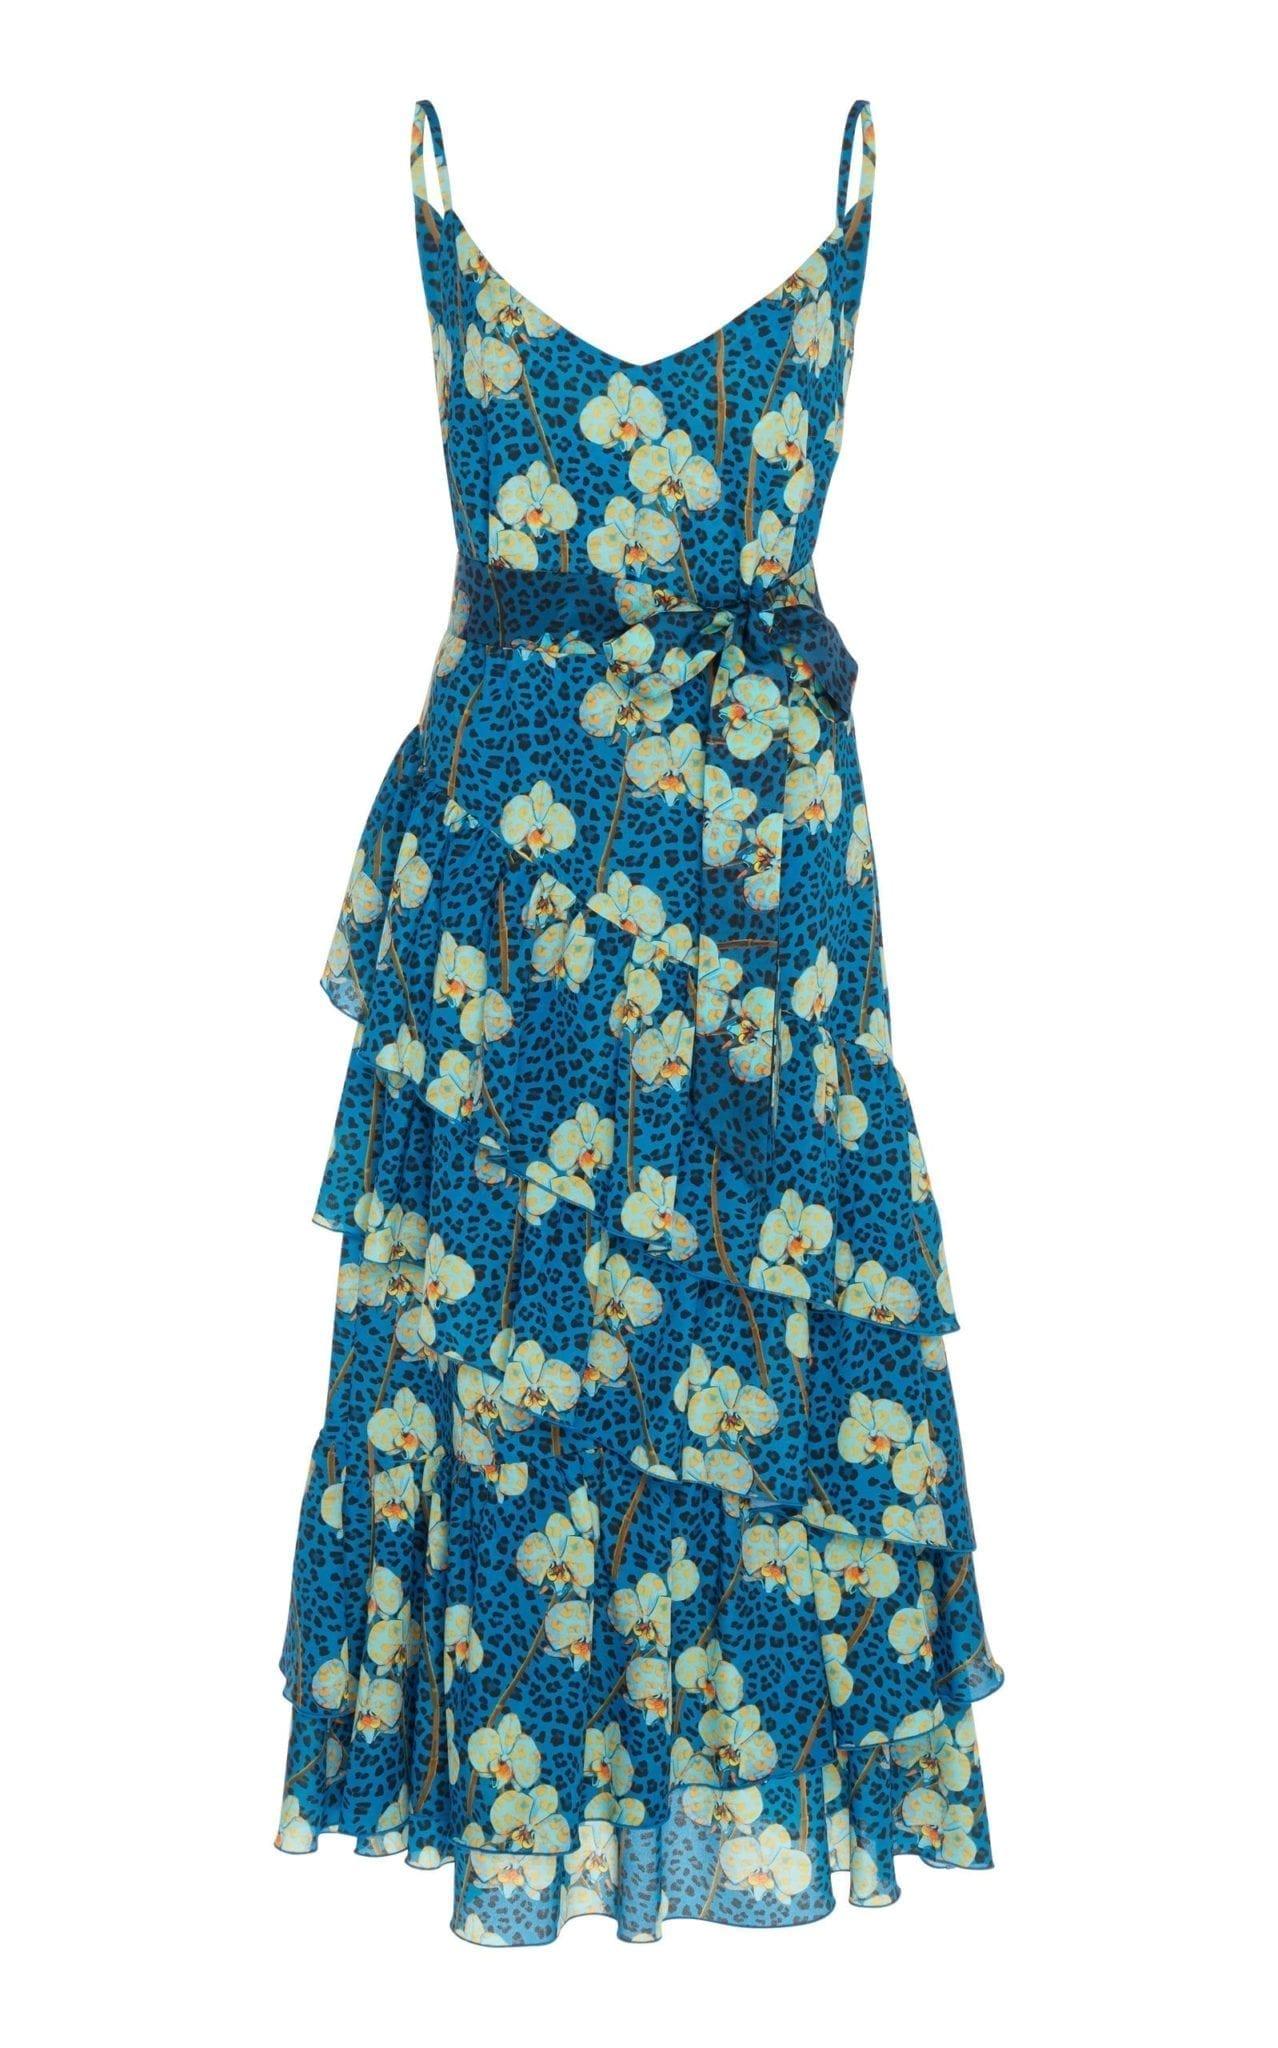 BORGO DE NOR Coco Ruffled Printed Crepe Midi Floral Dress